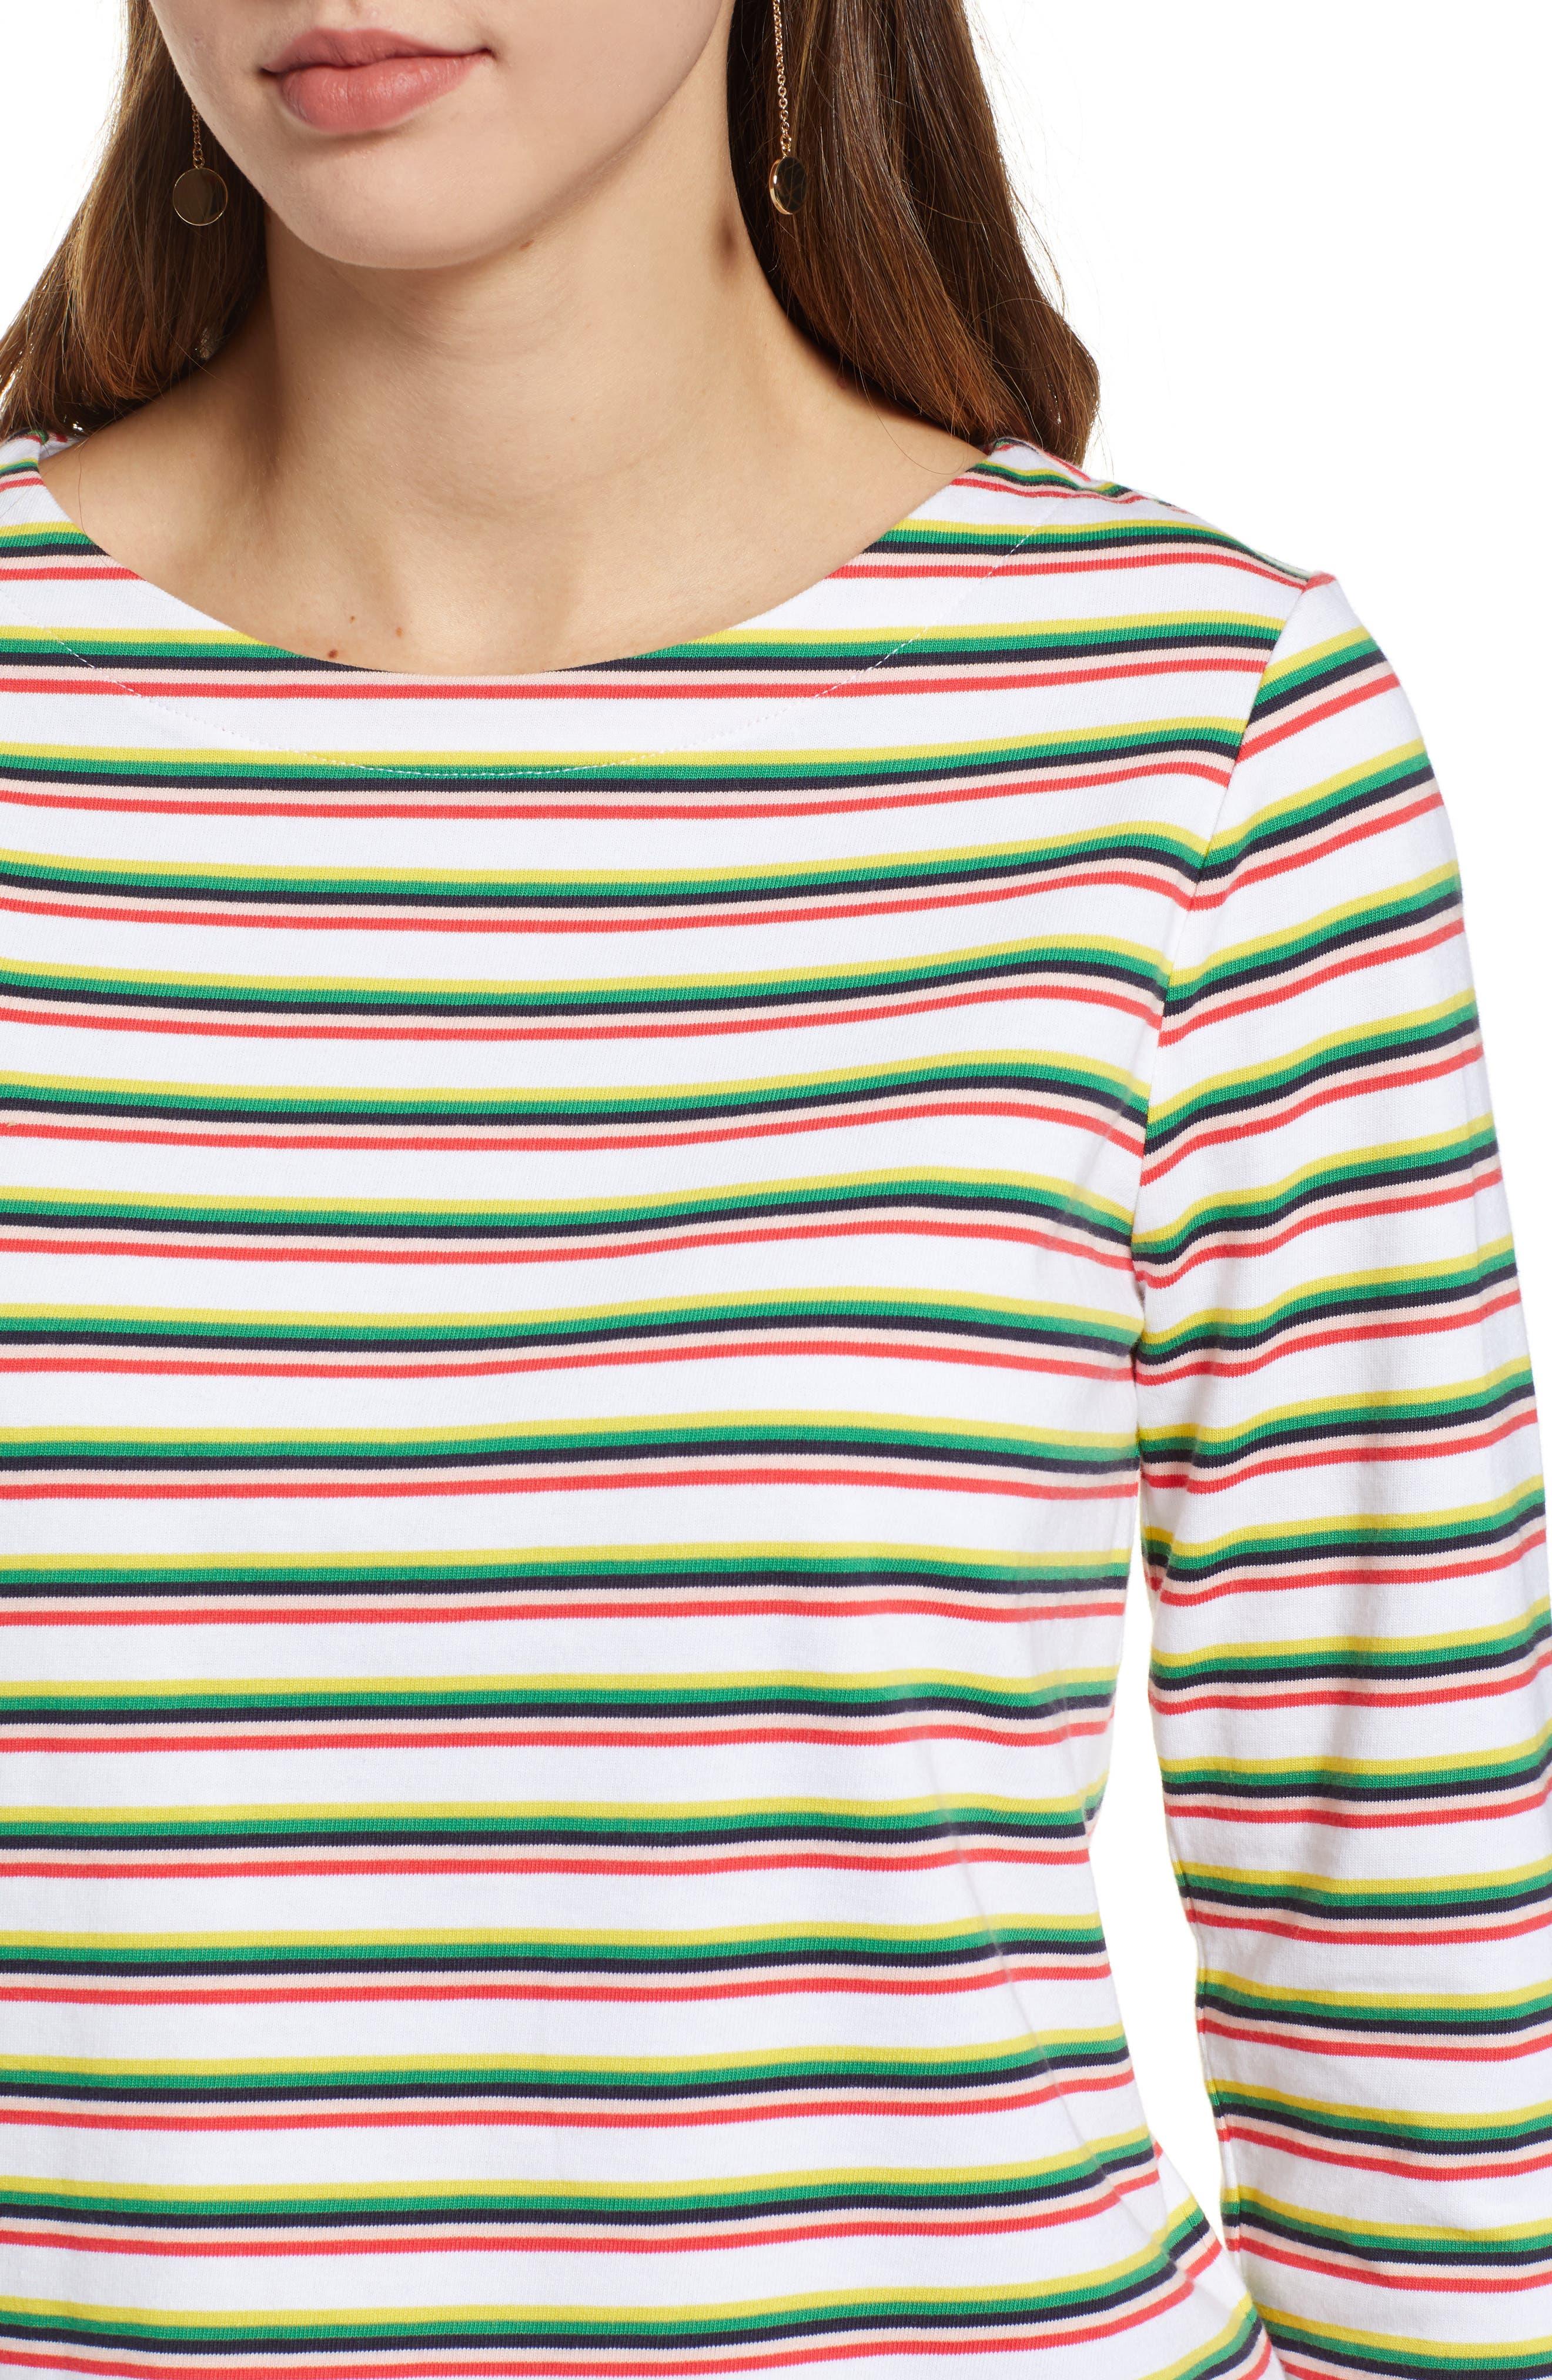 Stripe Top,                             Alternate thumbnail 4, color,                             WHITE MULTI PRIDE STRIPE